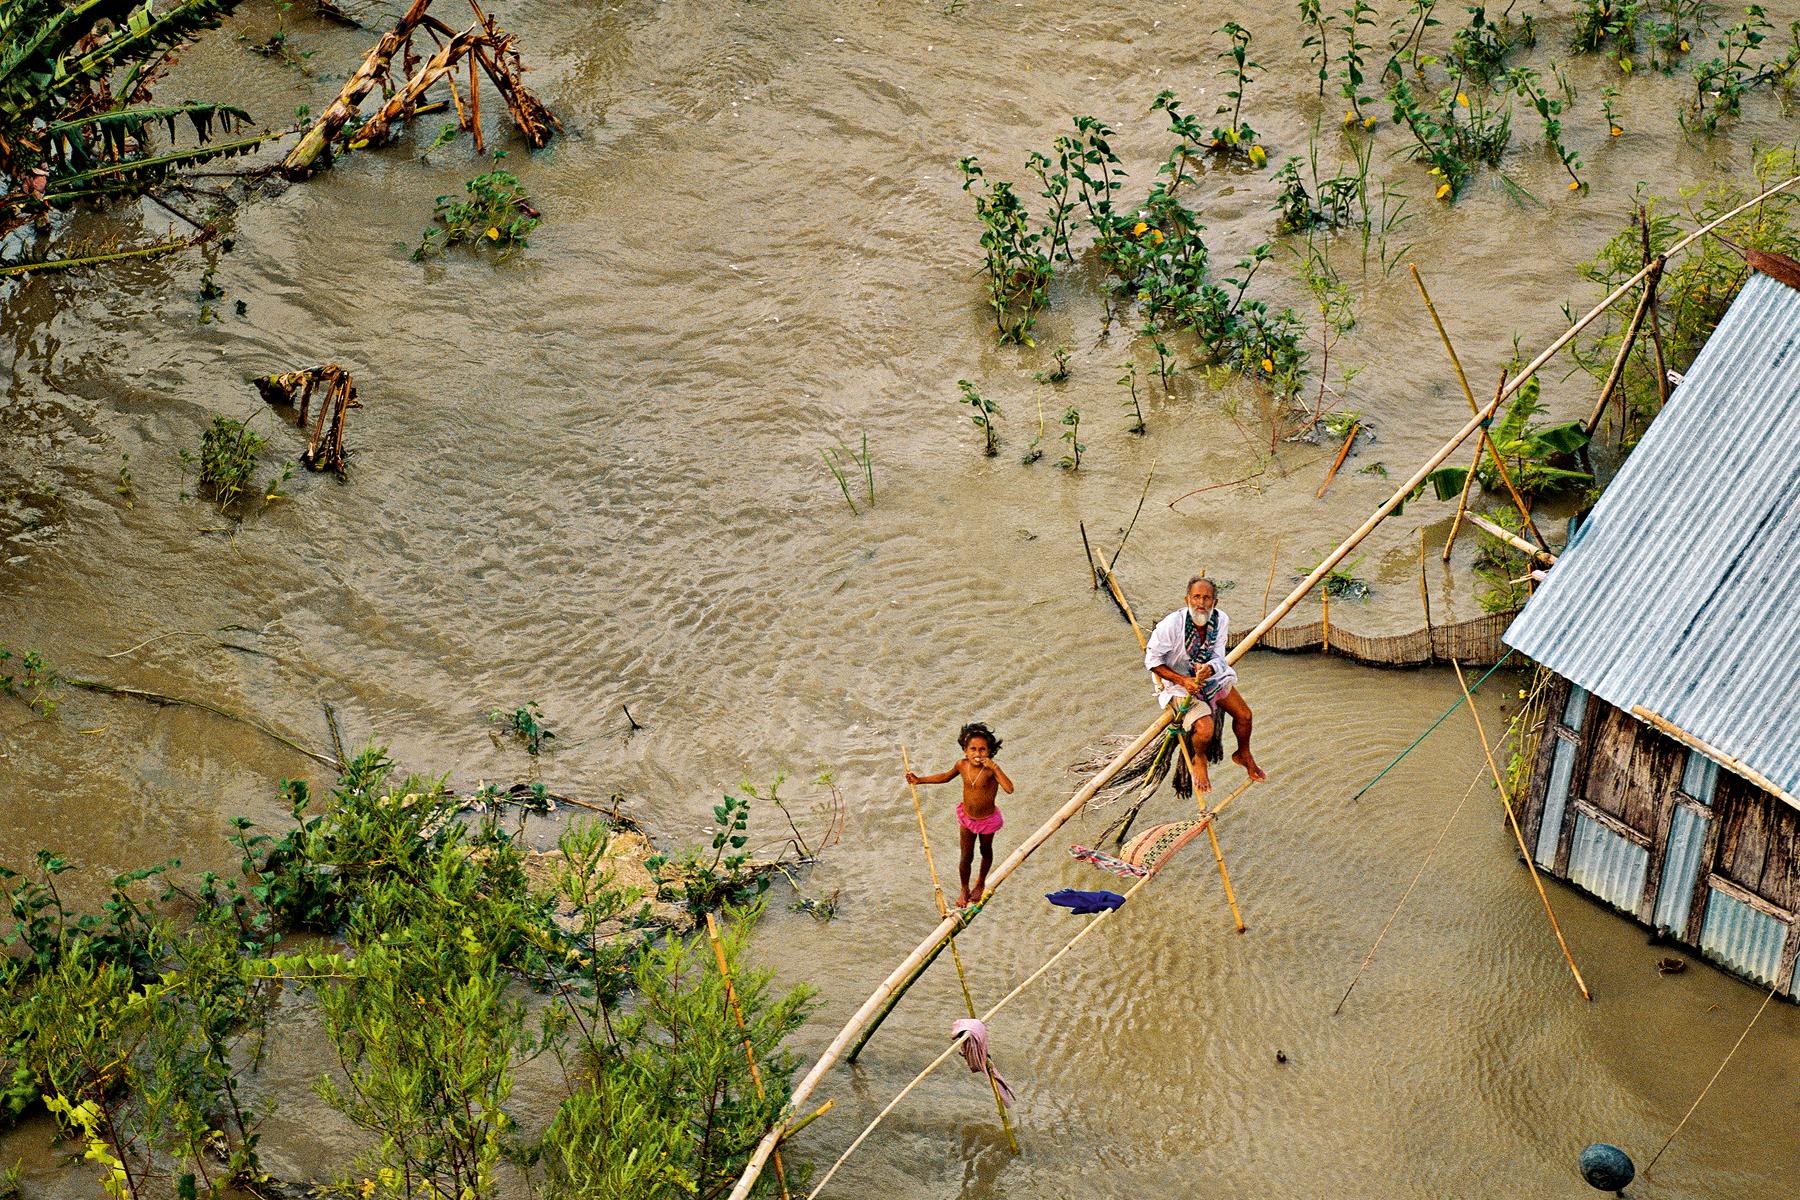 Bangladesh_couv-du-livre_∏Yann-Arthus-Bertrand-Altitude